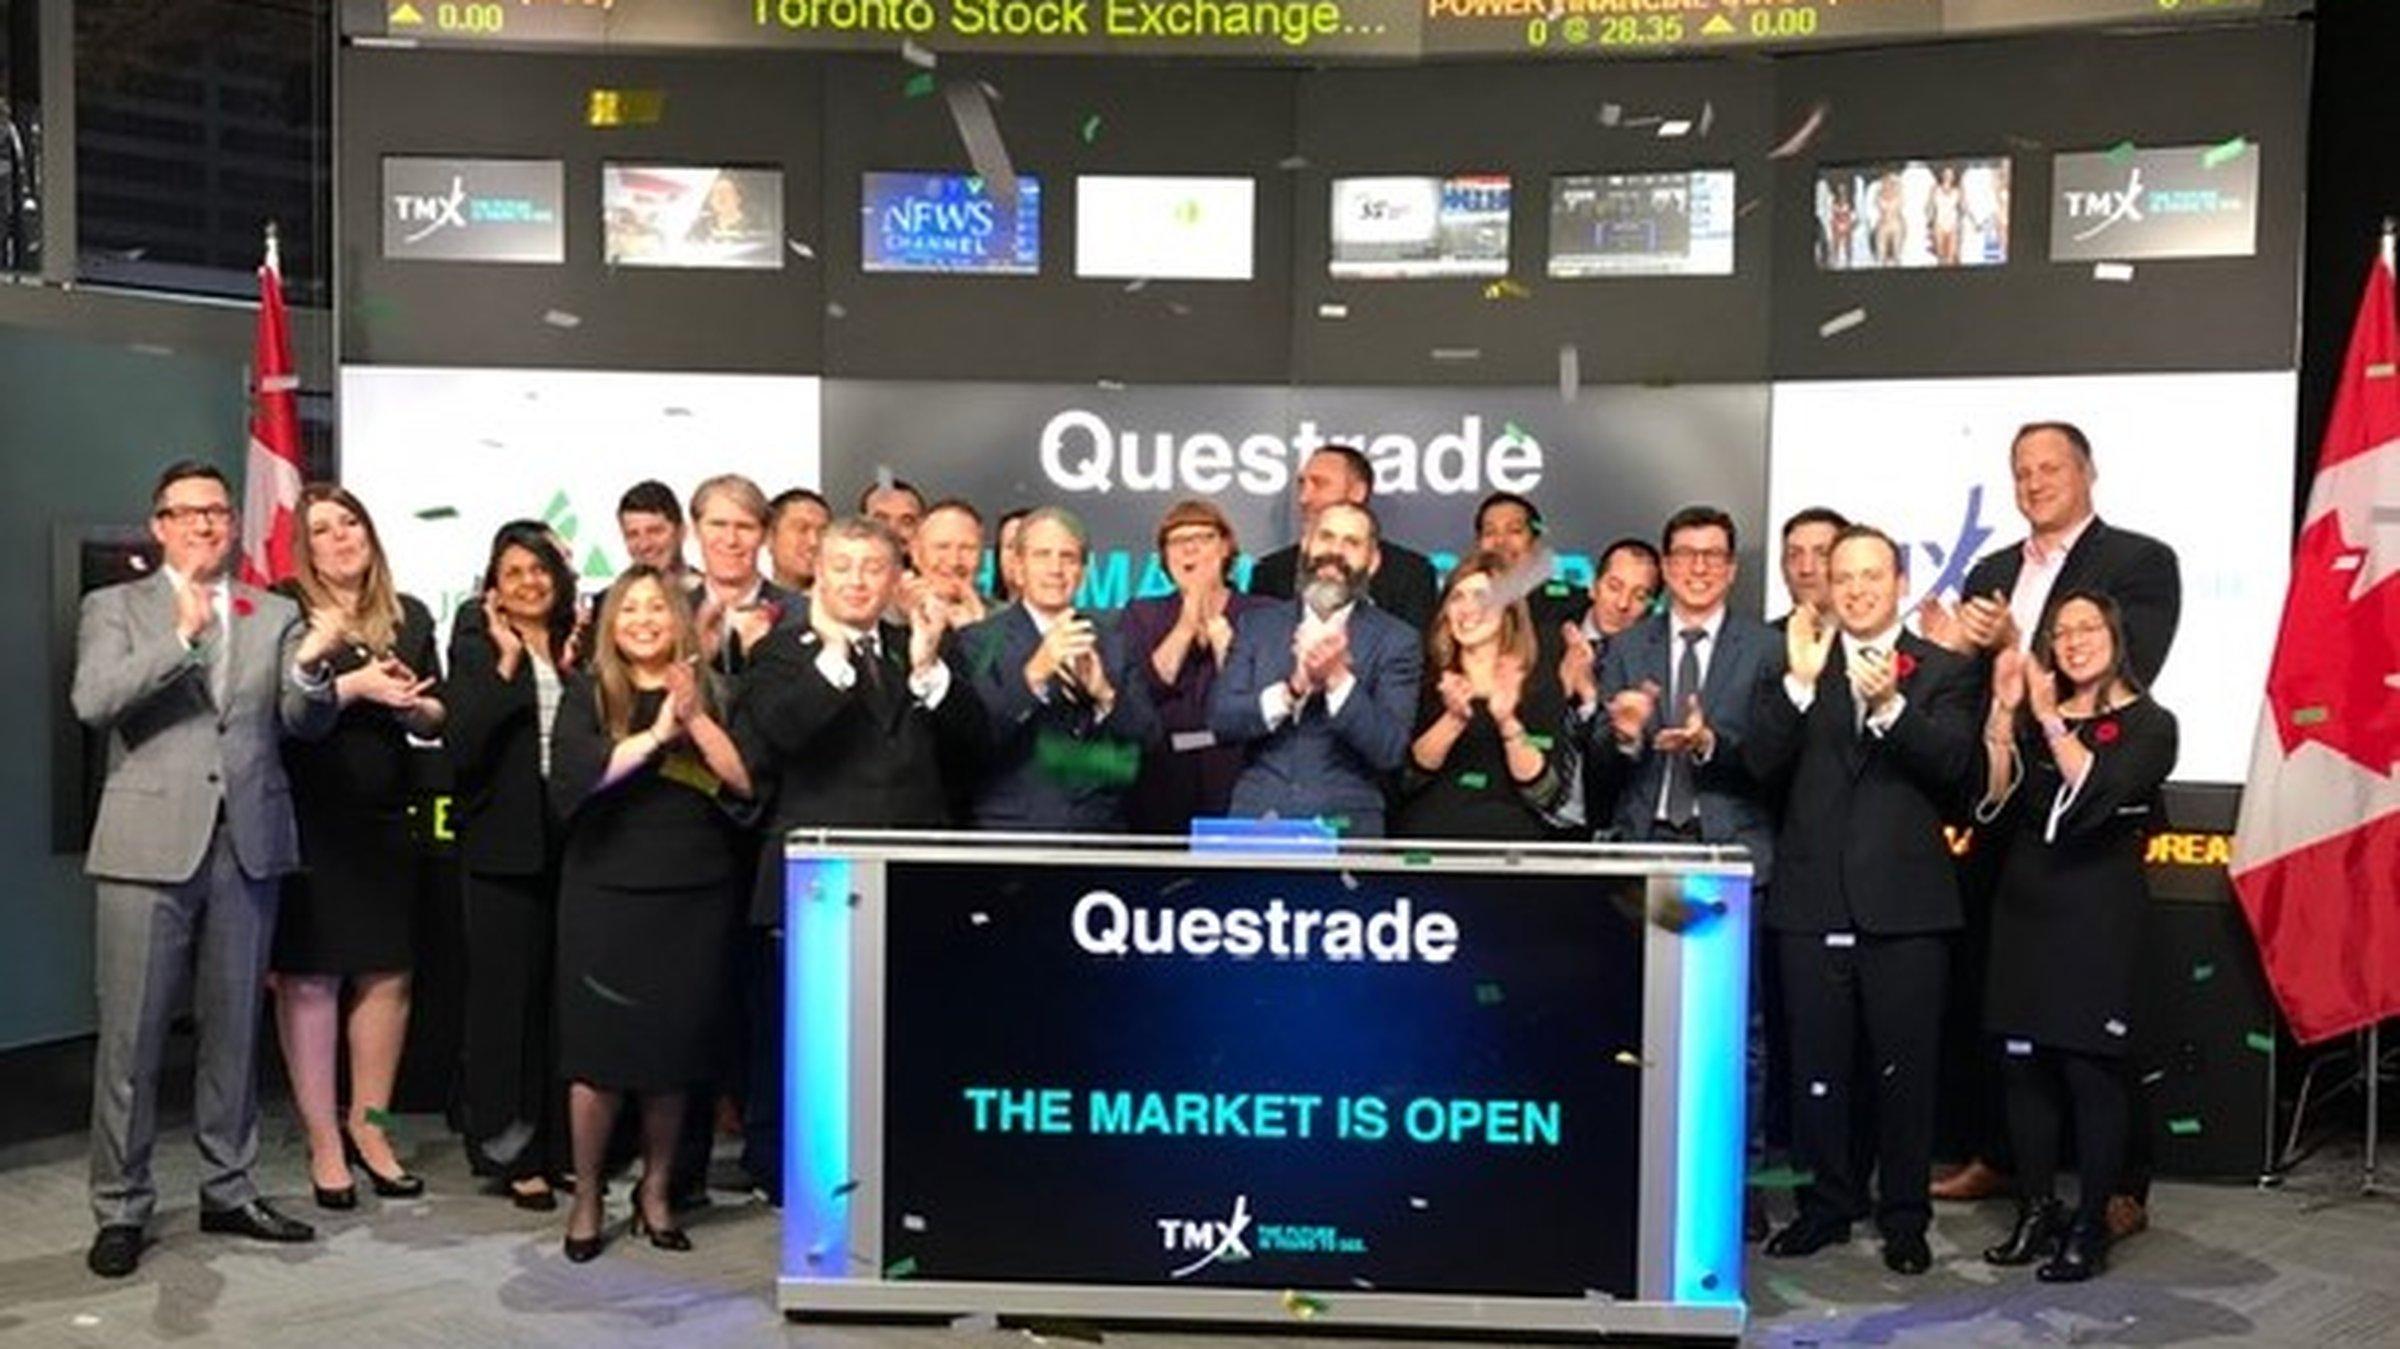 Top Employer: Questrade, Inc